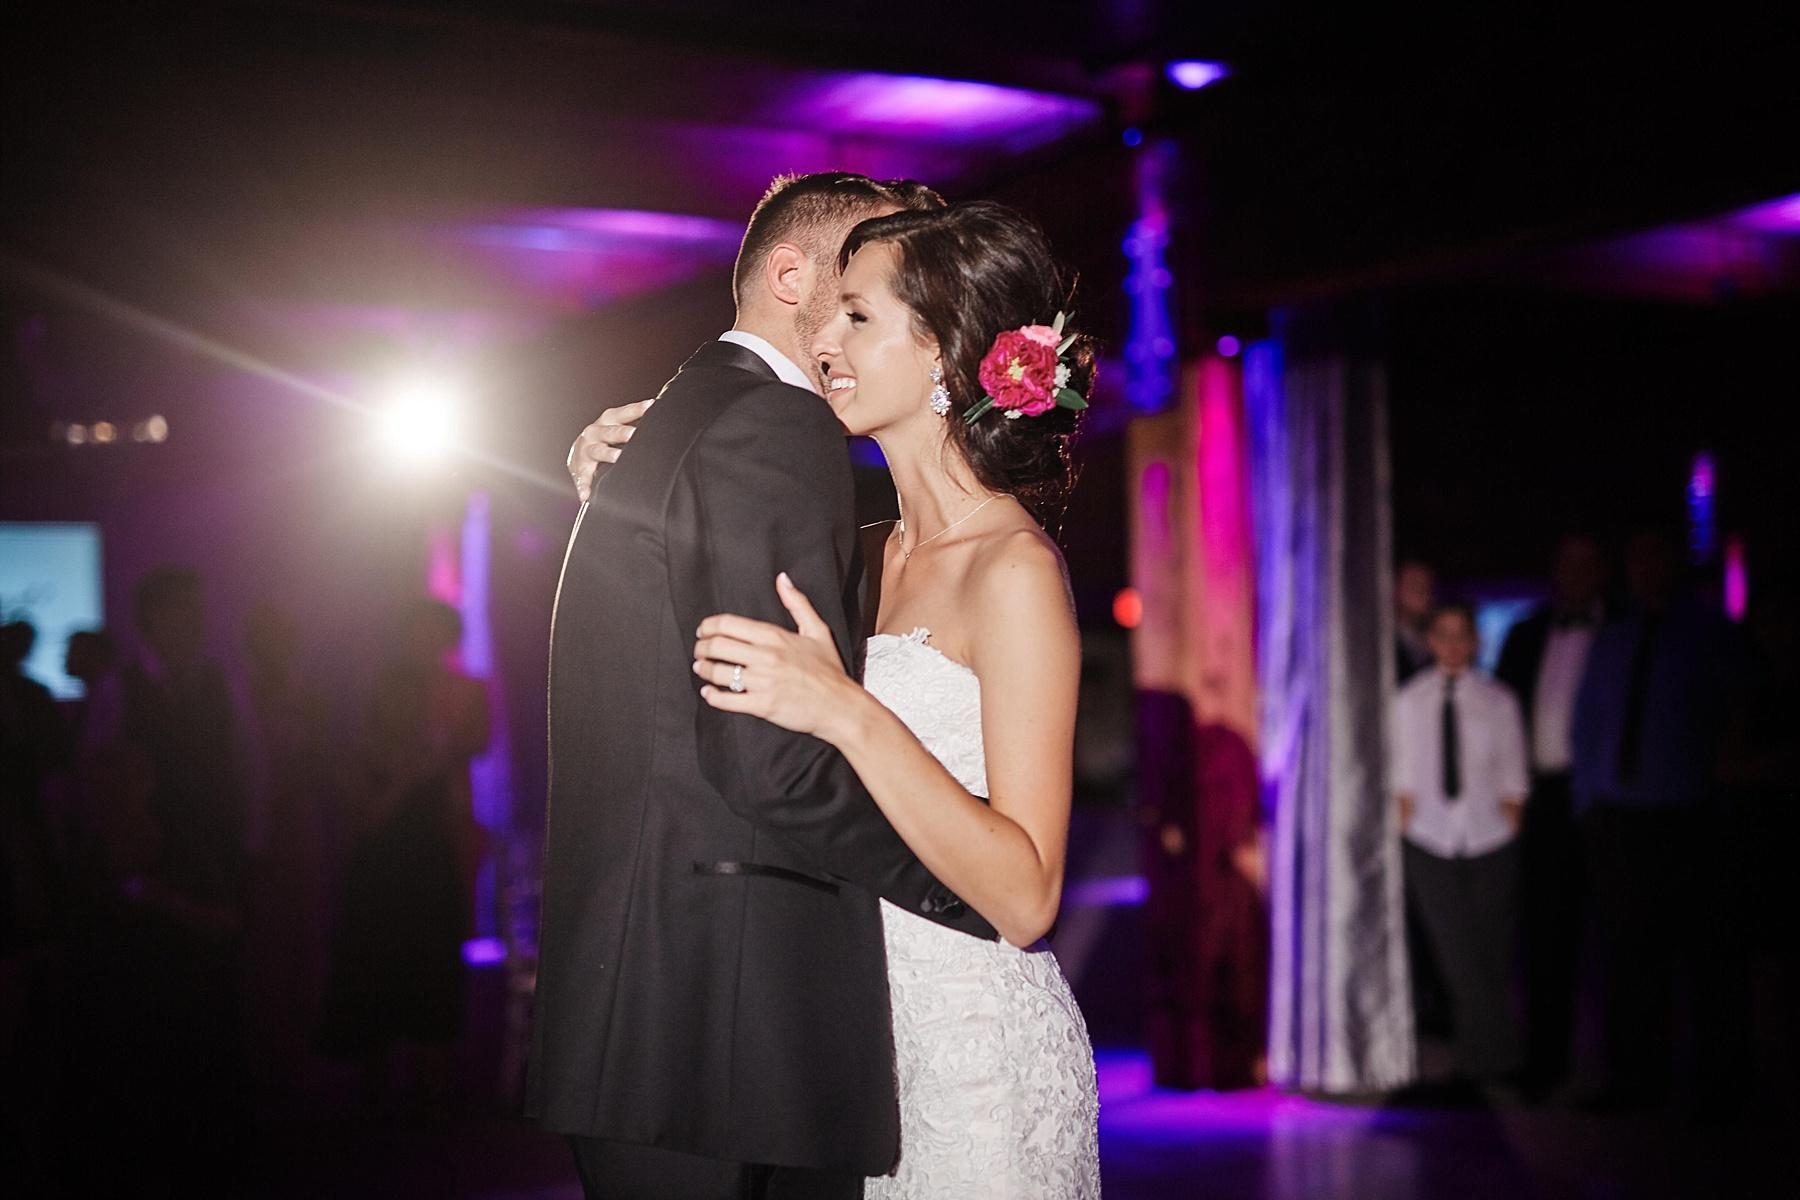 ABULAE-Wedding-Saint-paul-MN-Josh-Sofia-Wedding-Mears-Park_0843.jpg